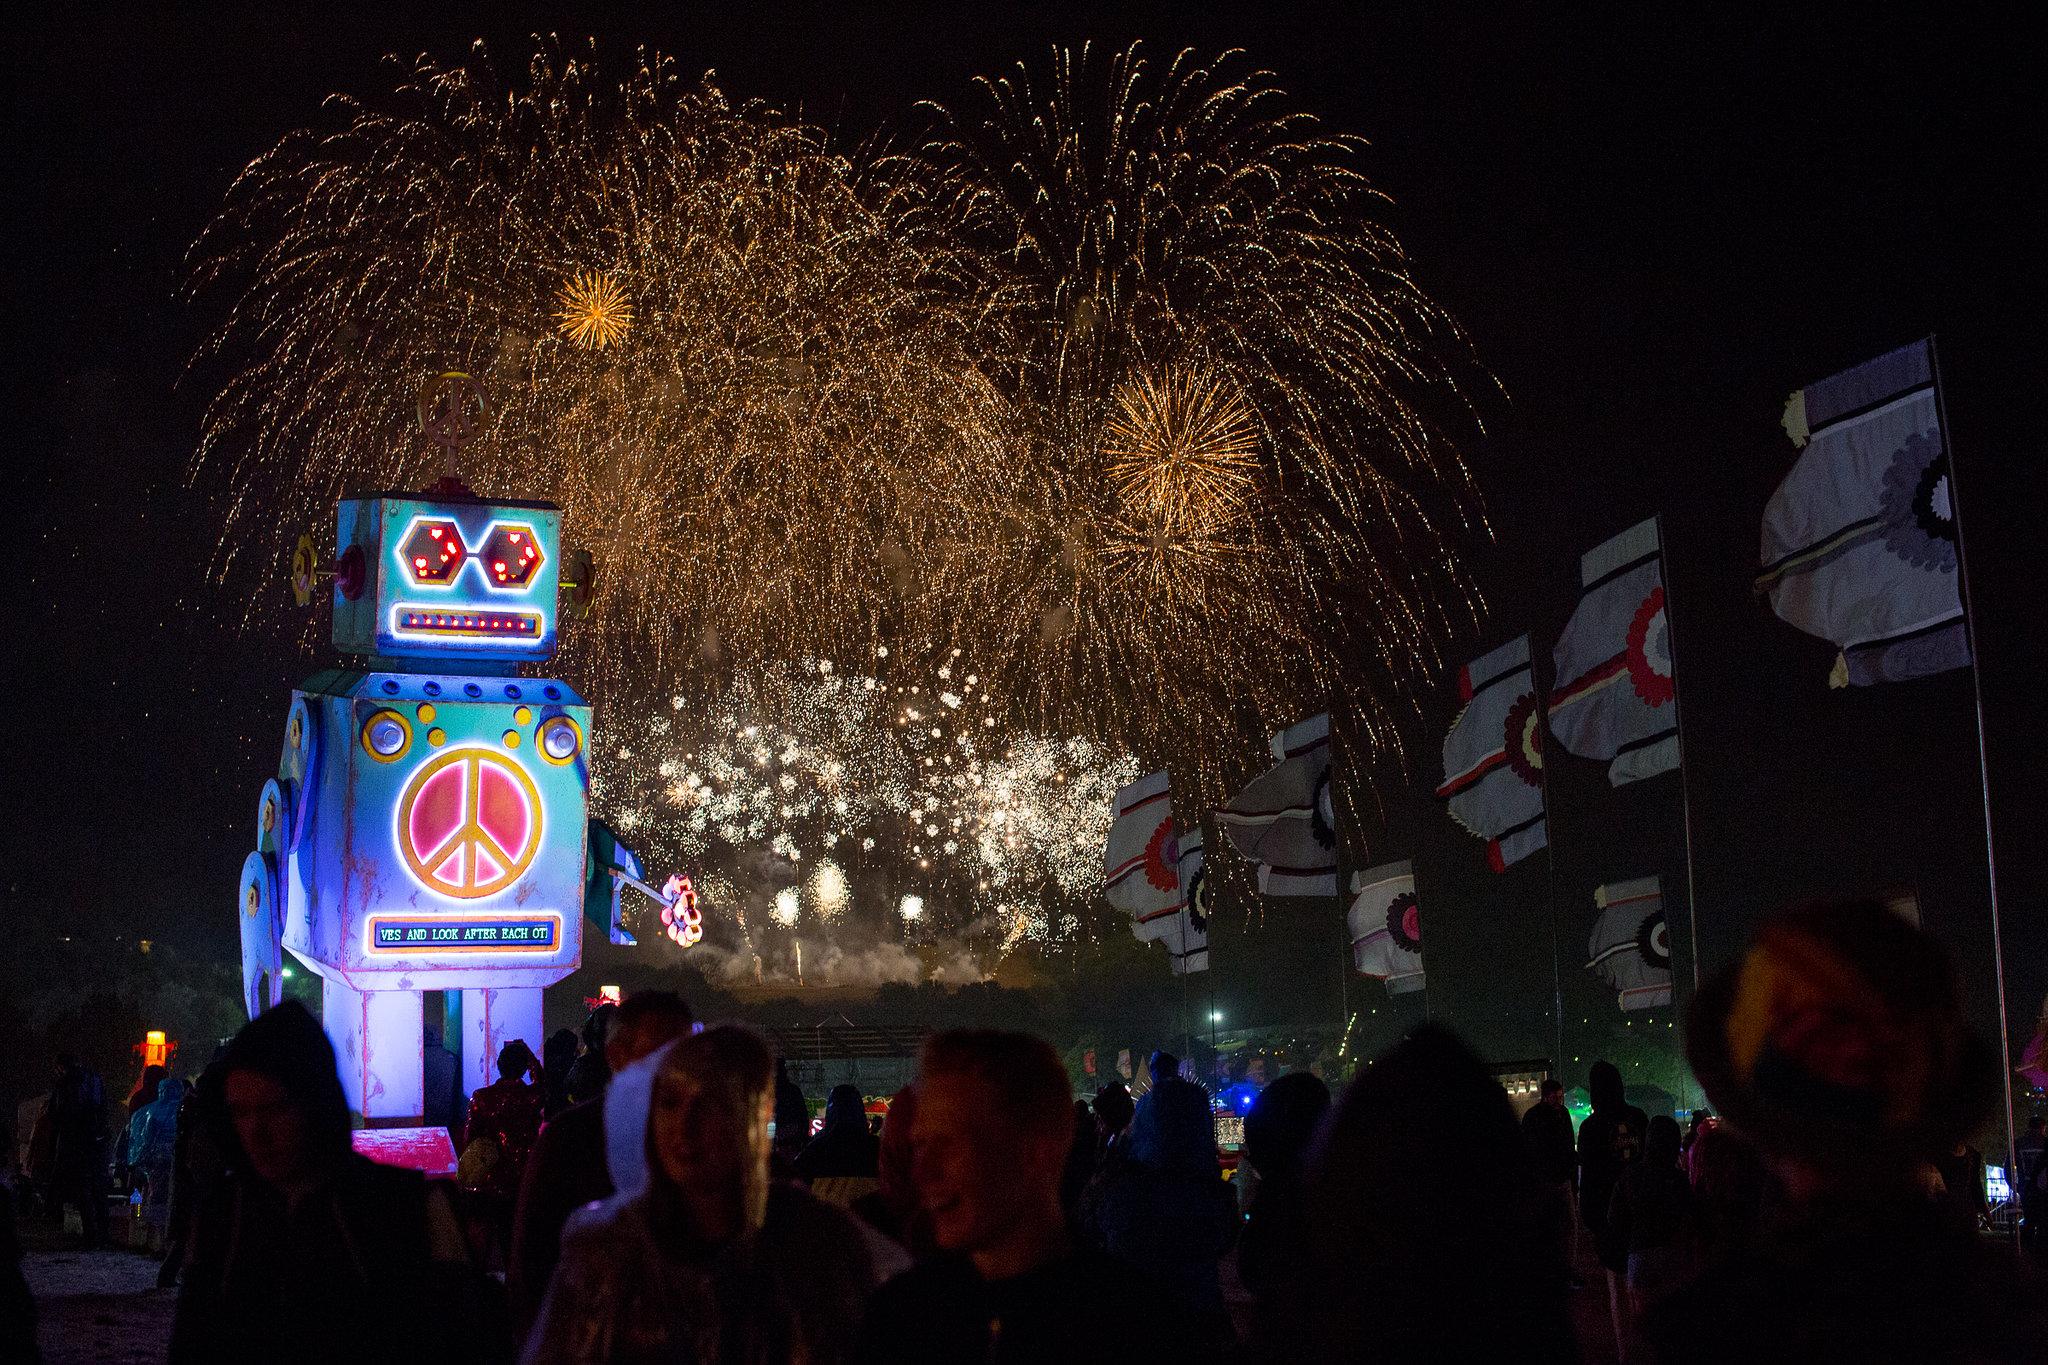 Victor Frankowski - The Love-bot & Fireworks - 6b80c58e-5a60-11e5-86f4-aee5d44592c4 - Web